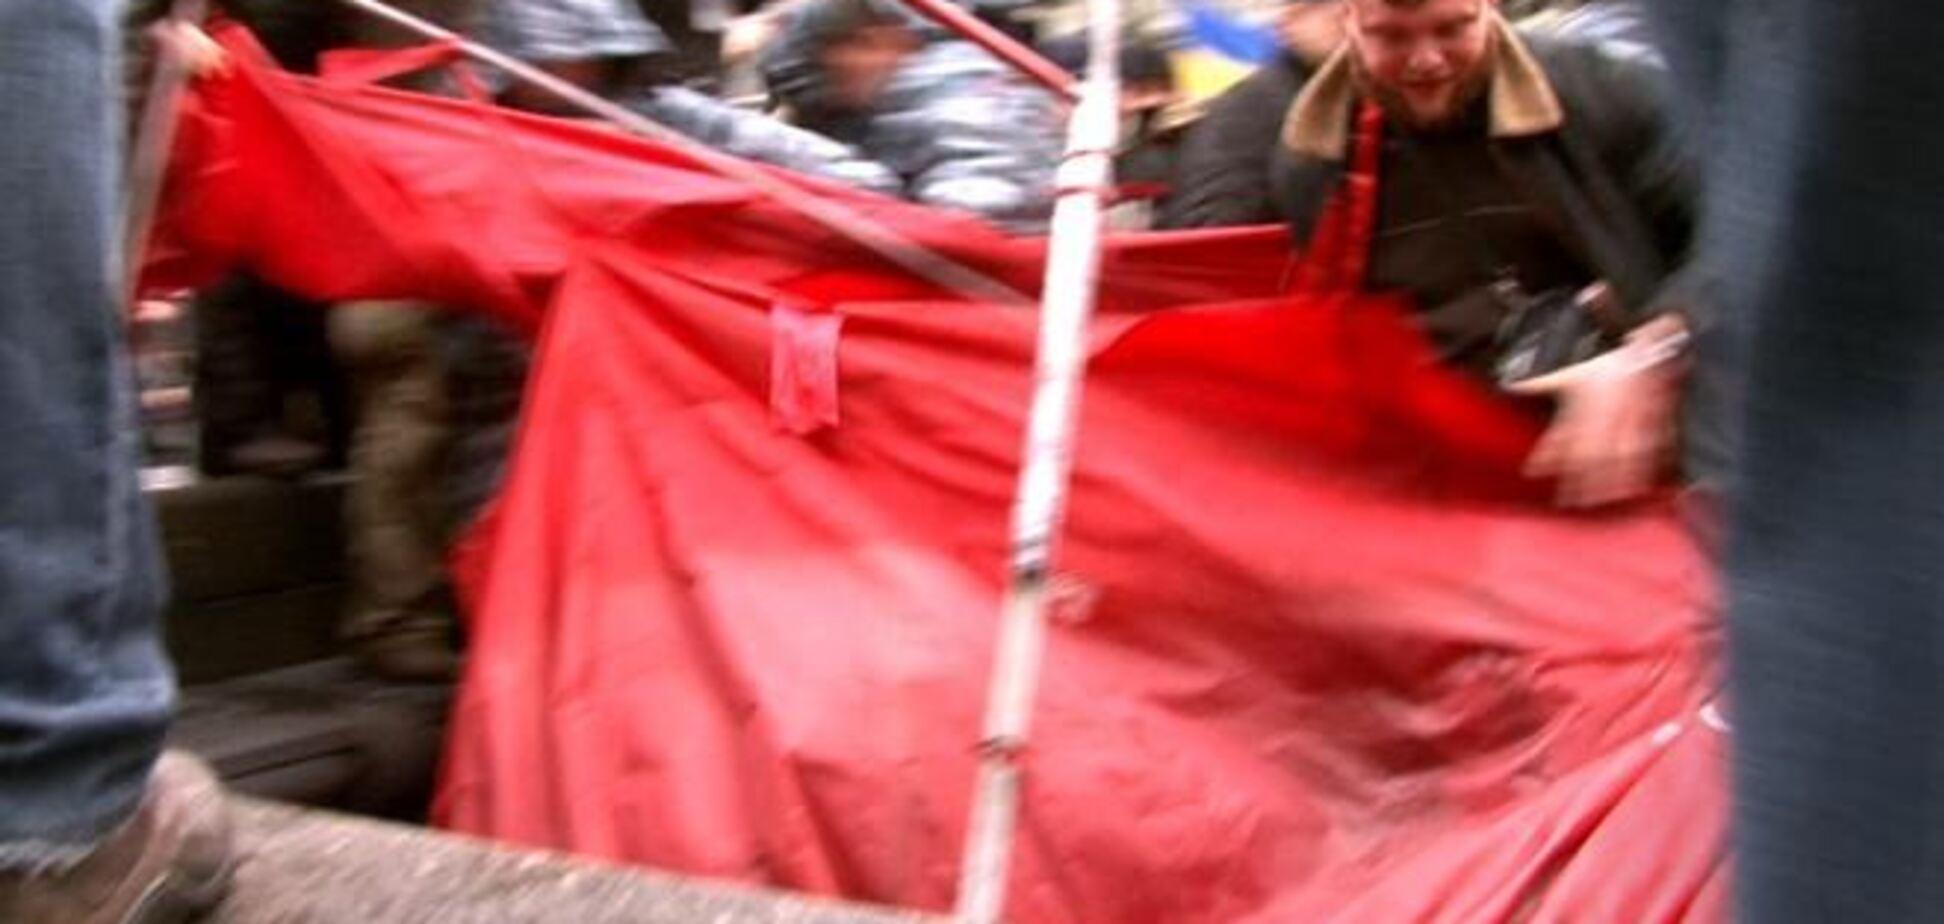 Участники евромитинга разорвали палатку КПУ